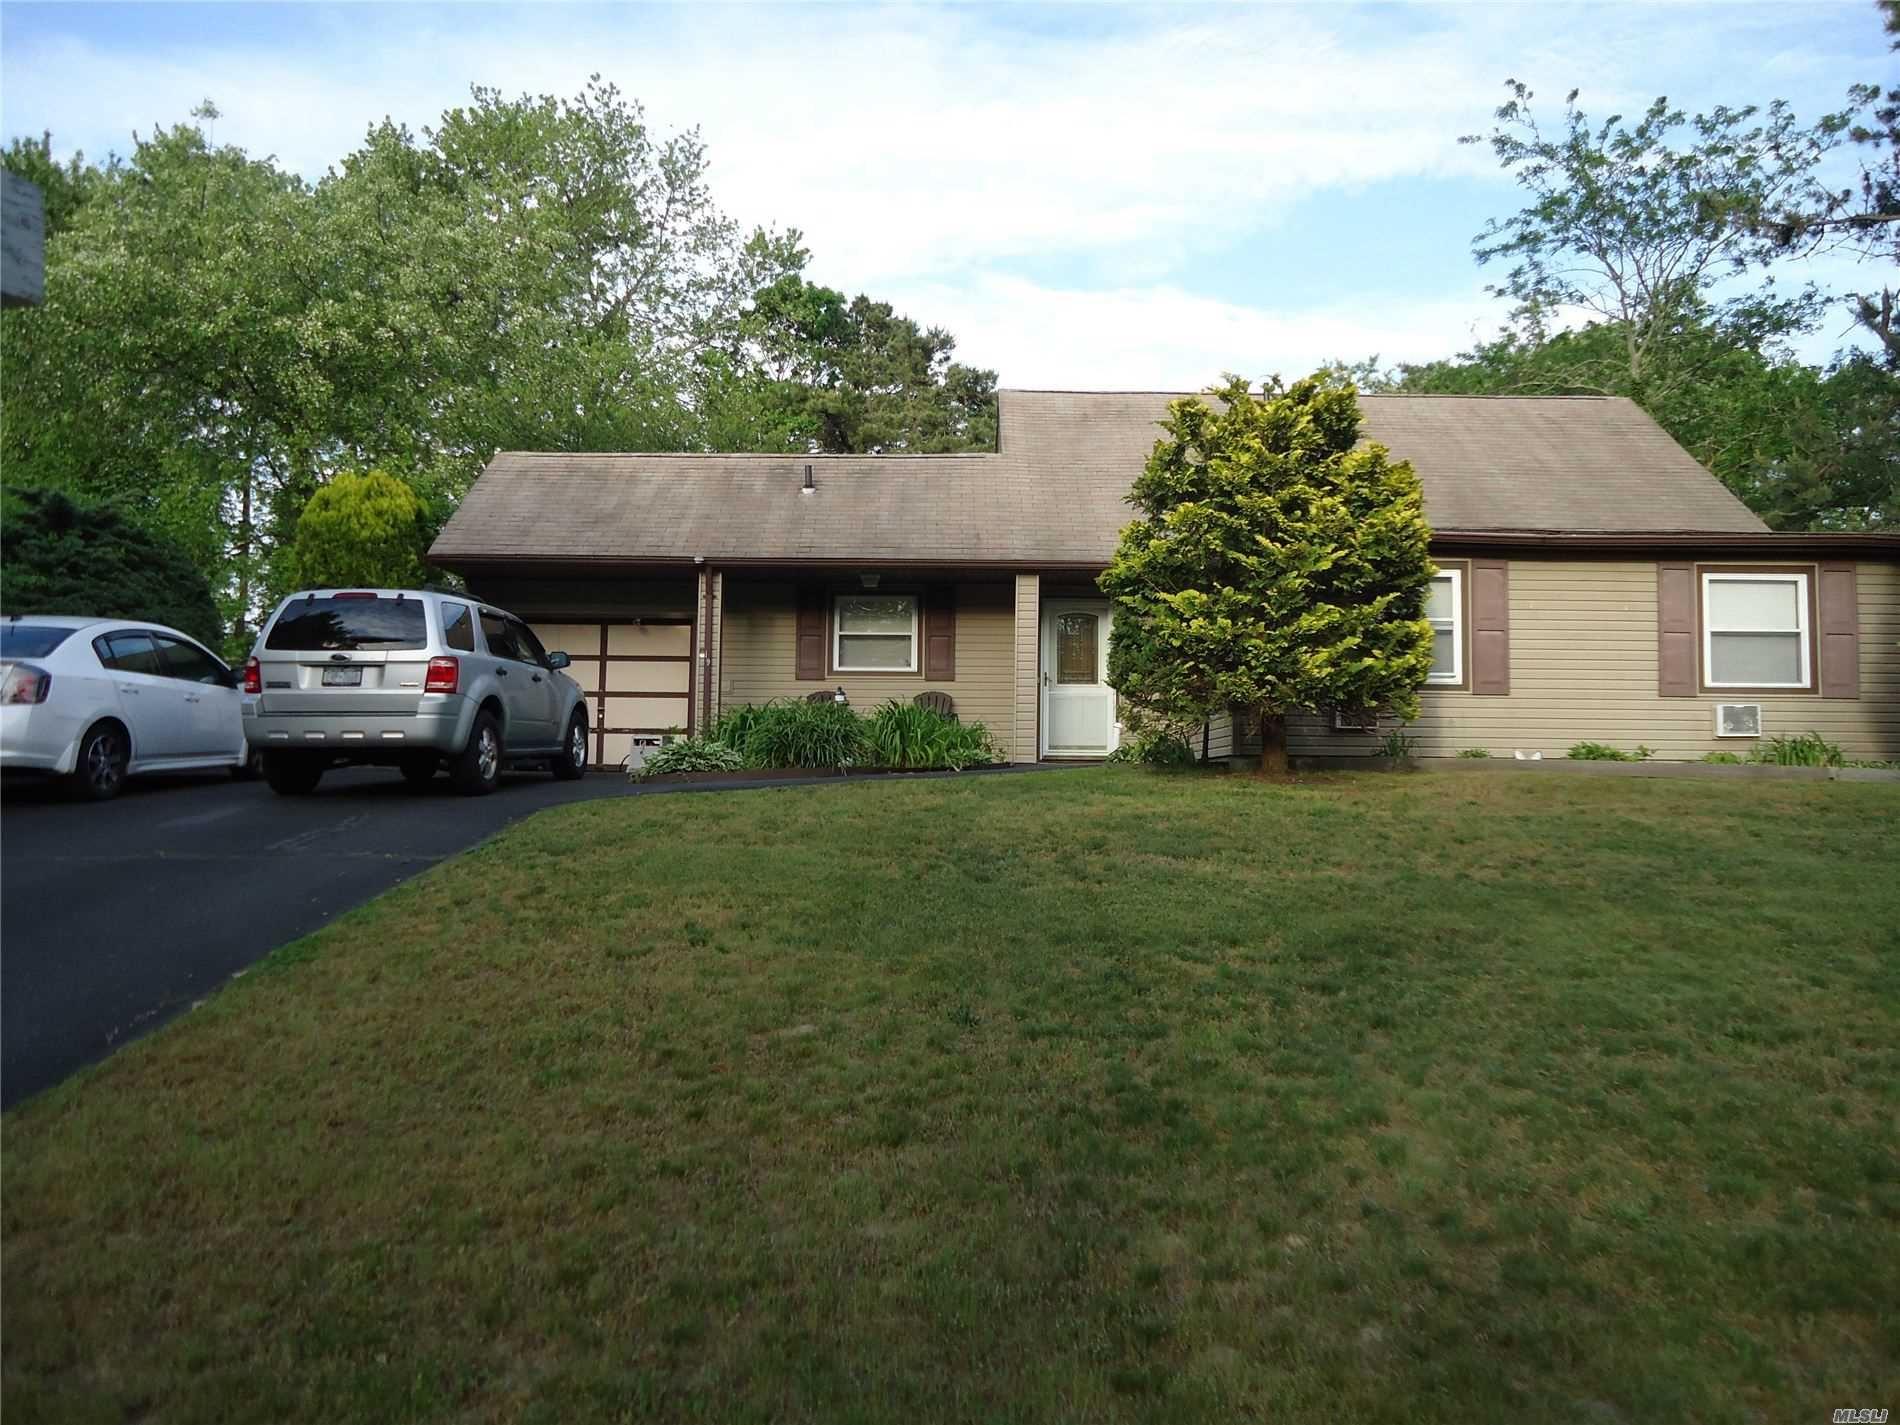 19 Clusterpine Street, Medford, NY 11763 - MLS#: 3204226